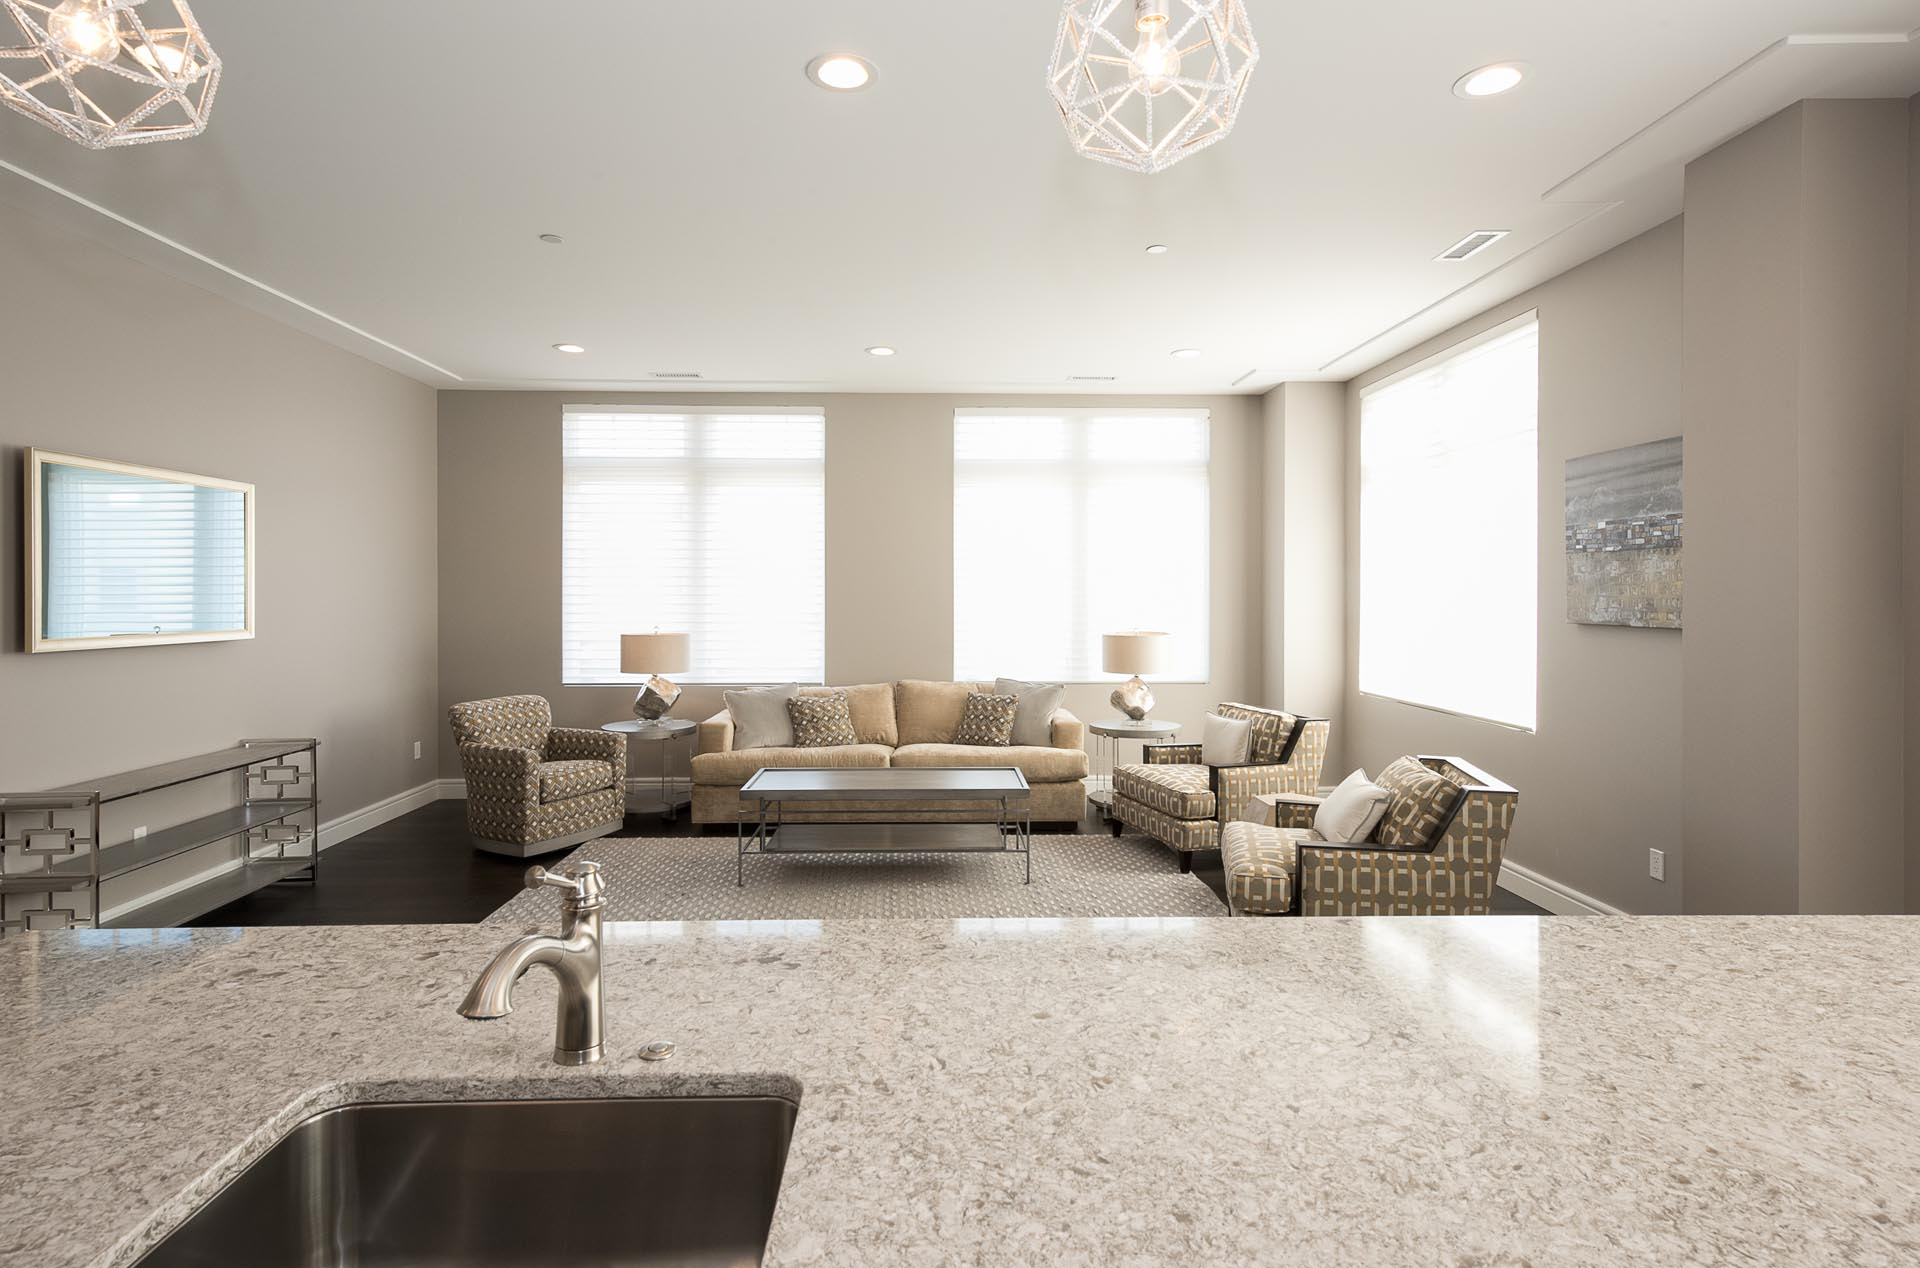 Condo Design | H Residence | Midland, MI